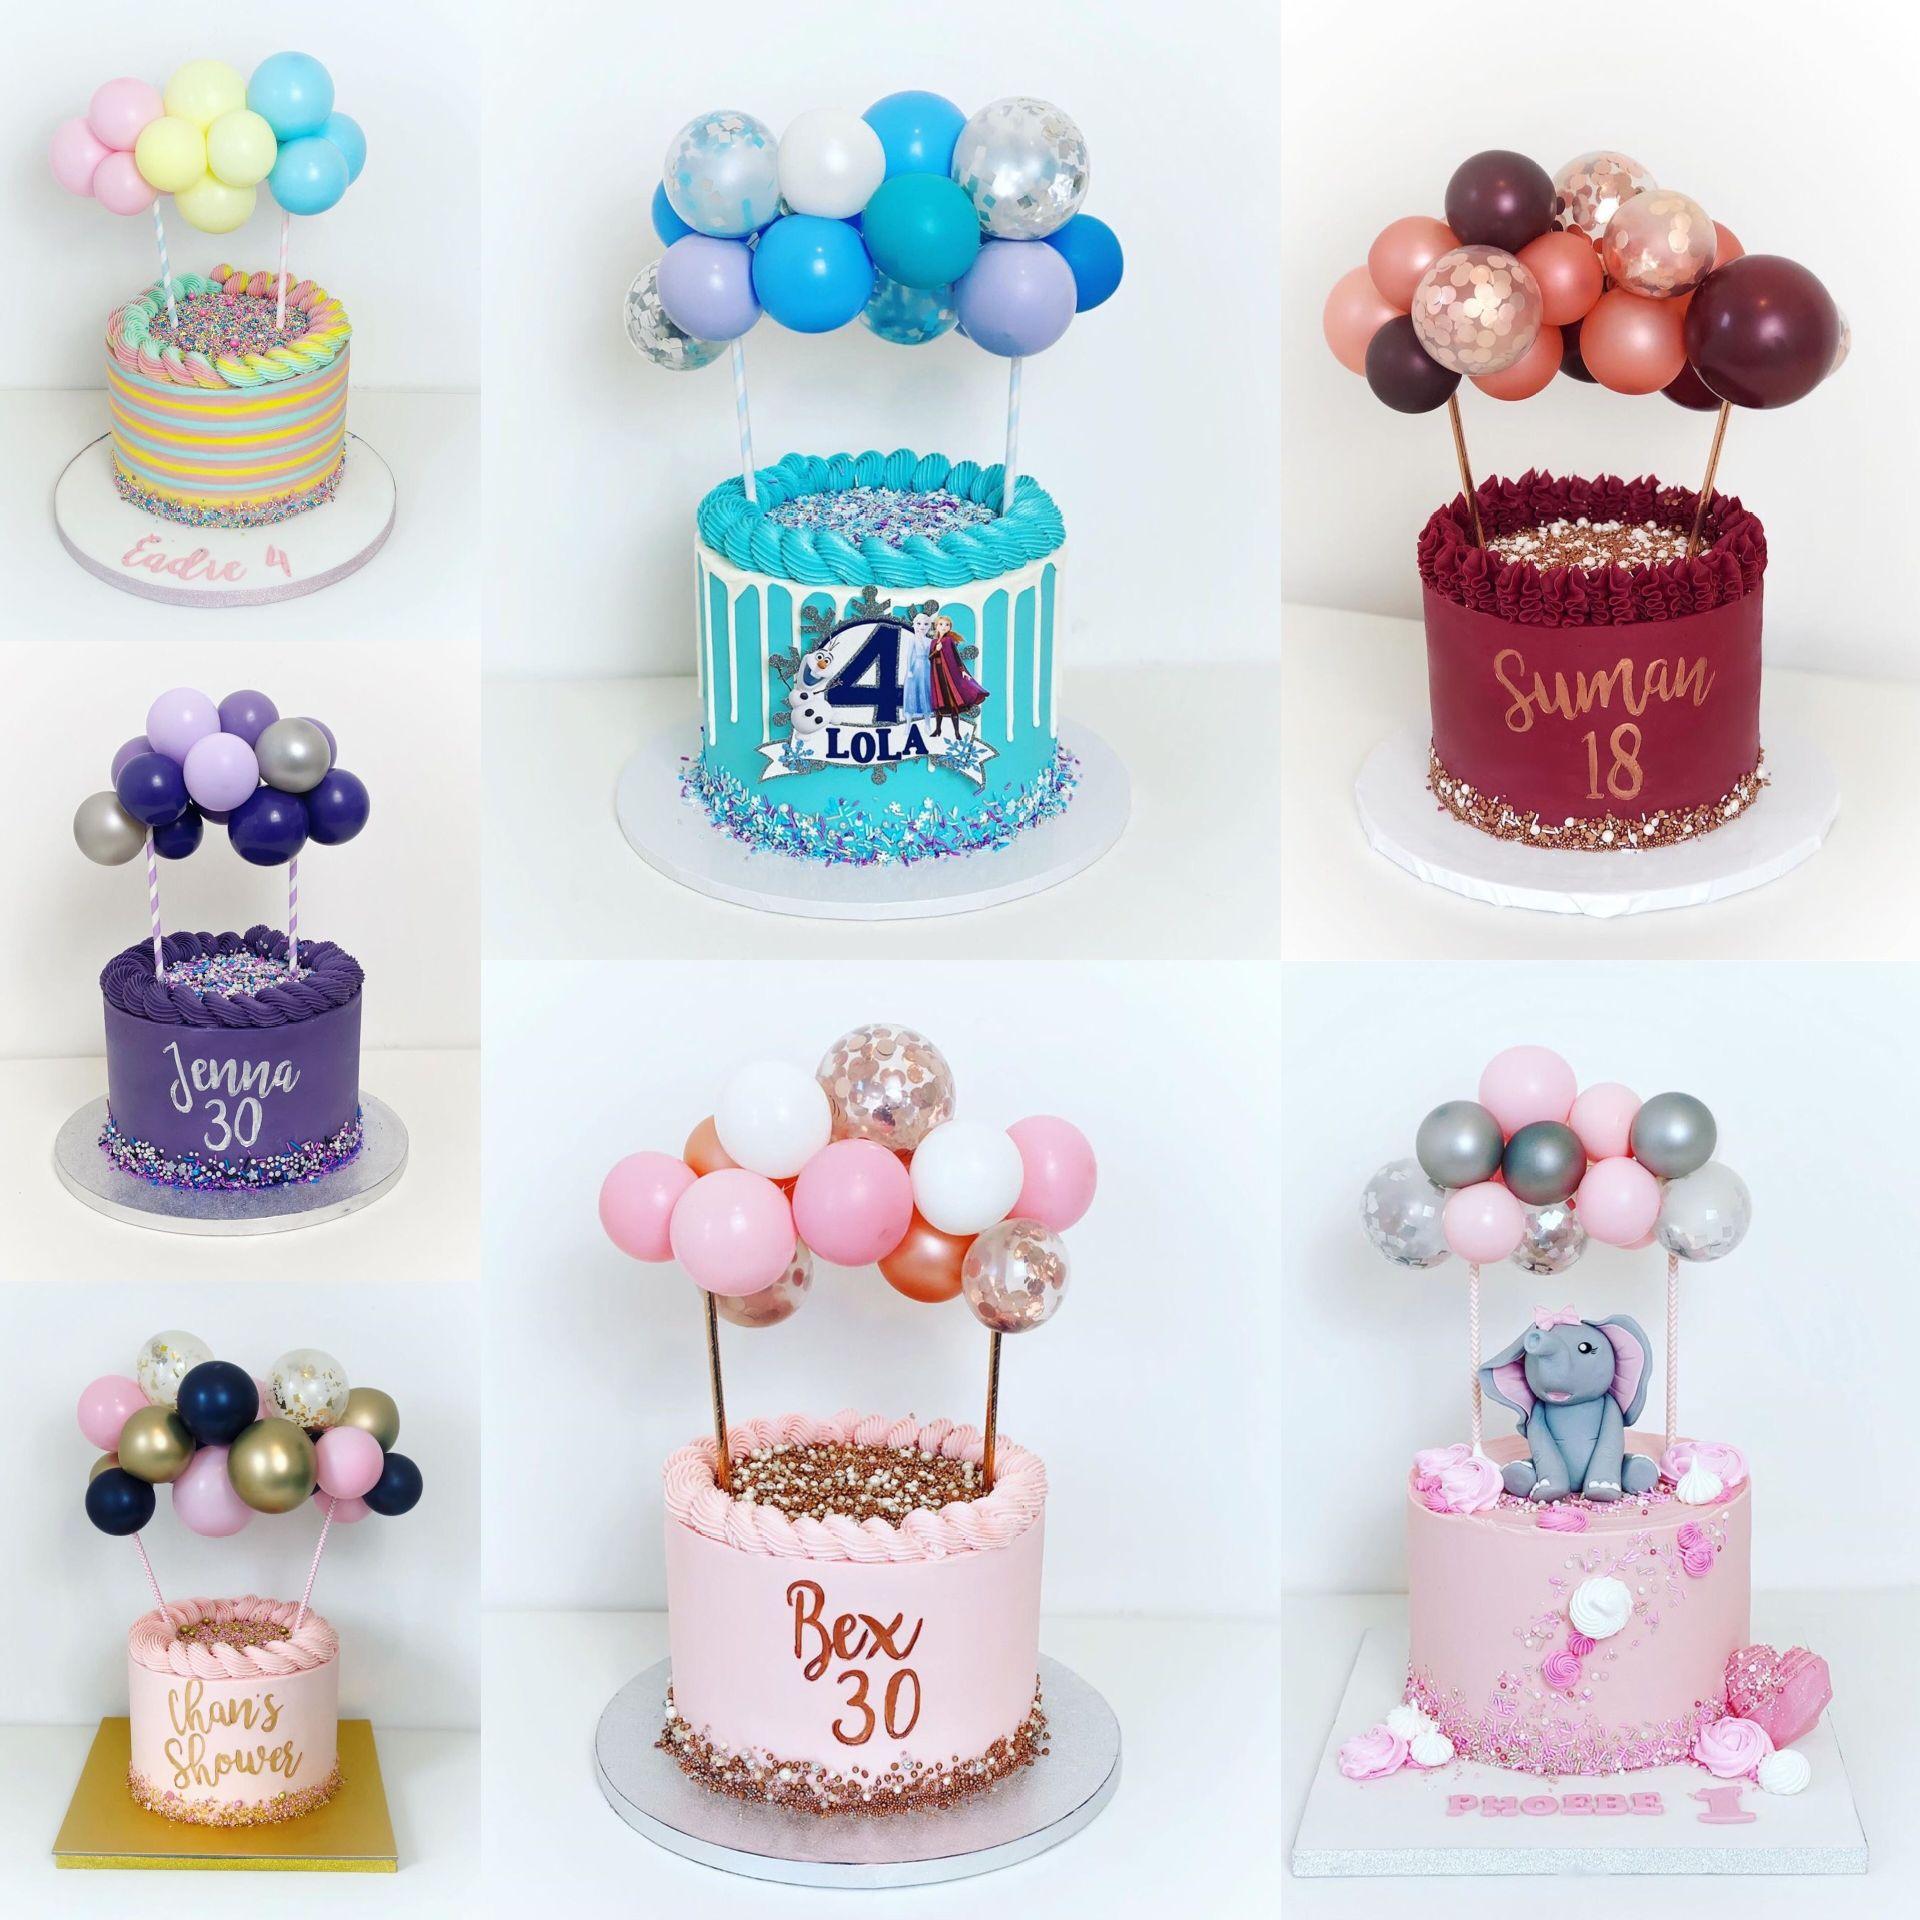 14pcs/set 5inch Latex Balloons Confetti Baloon With Stick Glue Balloon Ribbon Birthday Party Wedding Cake Topper Cake Decoration